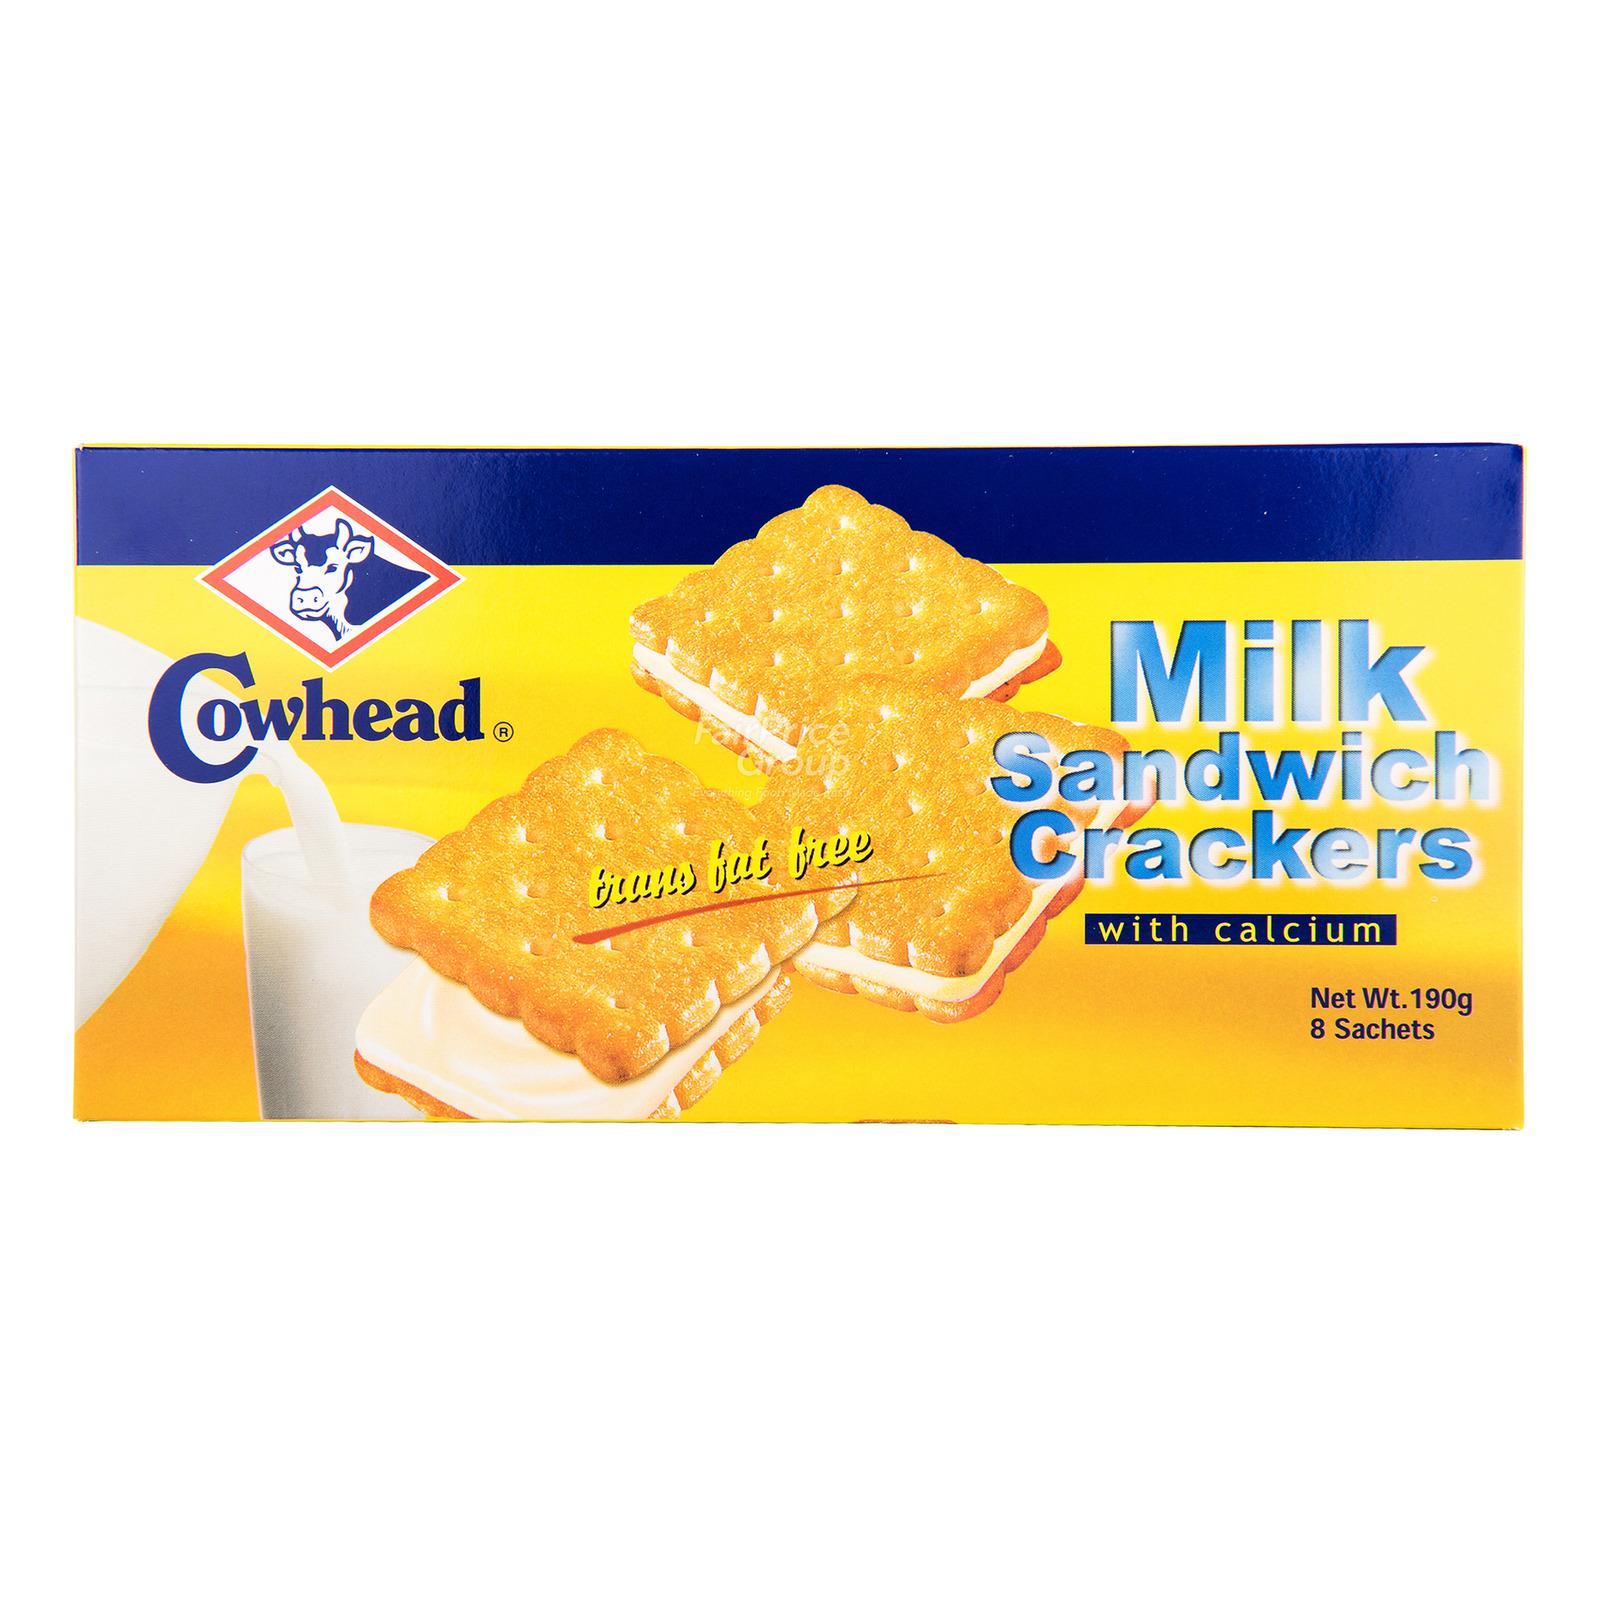 Cowhead Sandwich Crackers with Calcium - Milk